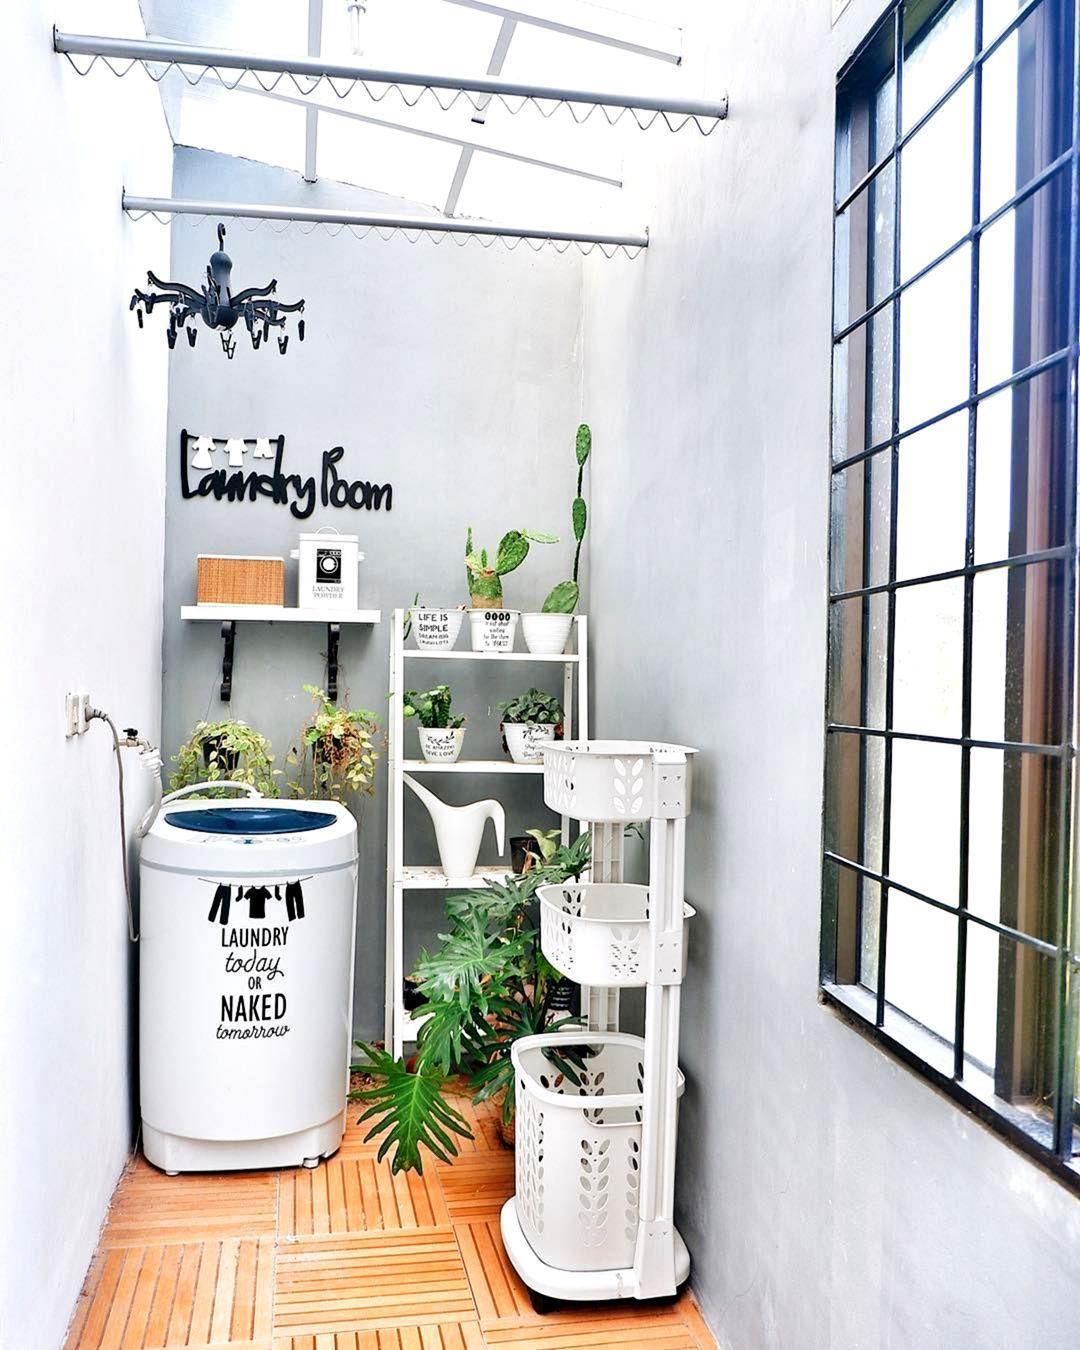 Look Fresh With 7 Minimalist Laundry Room Decoration Ideas Outdoor Laundry Rooms Laundry Room Design Laundry Room Decor Laundry room design ideas